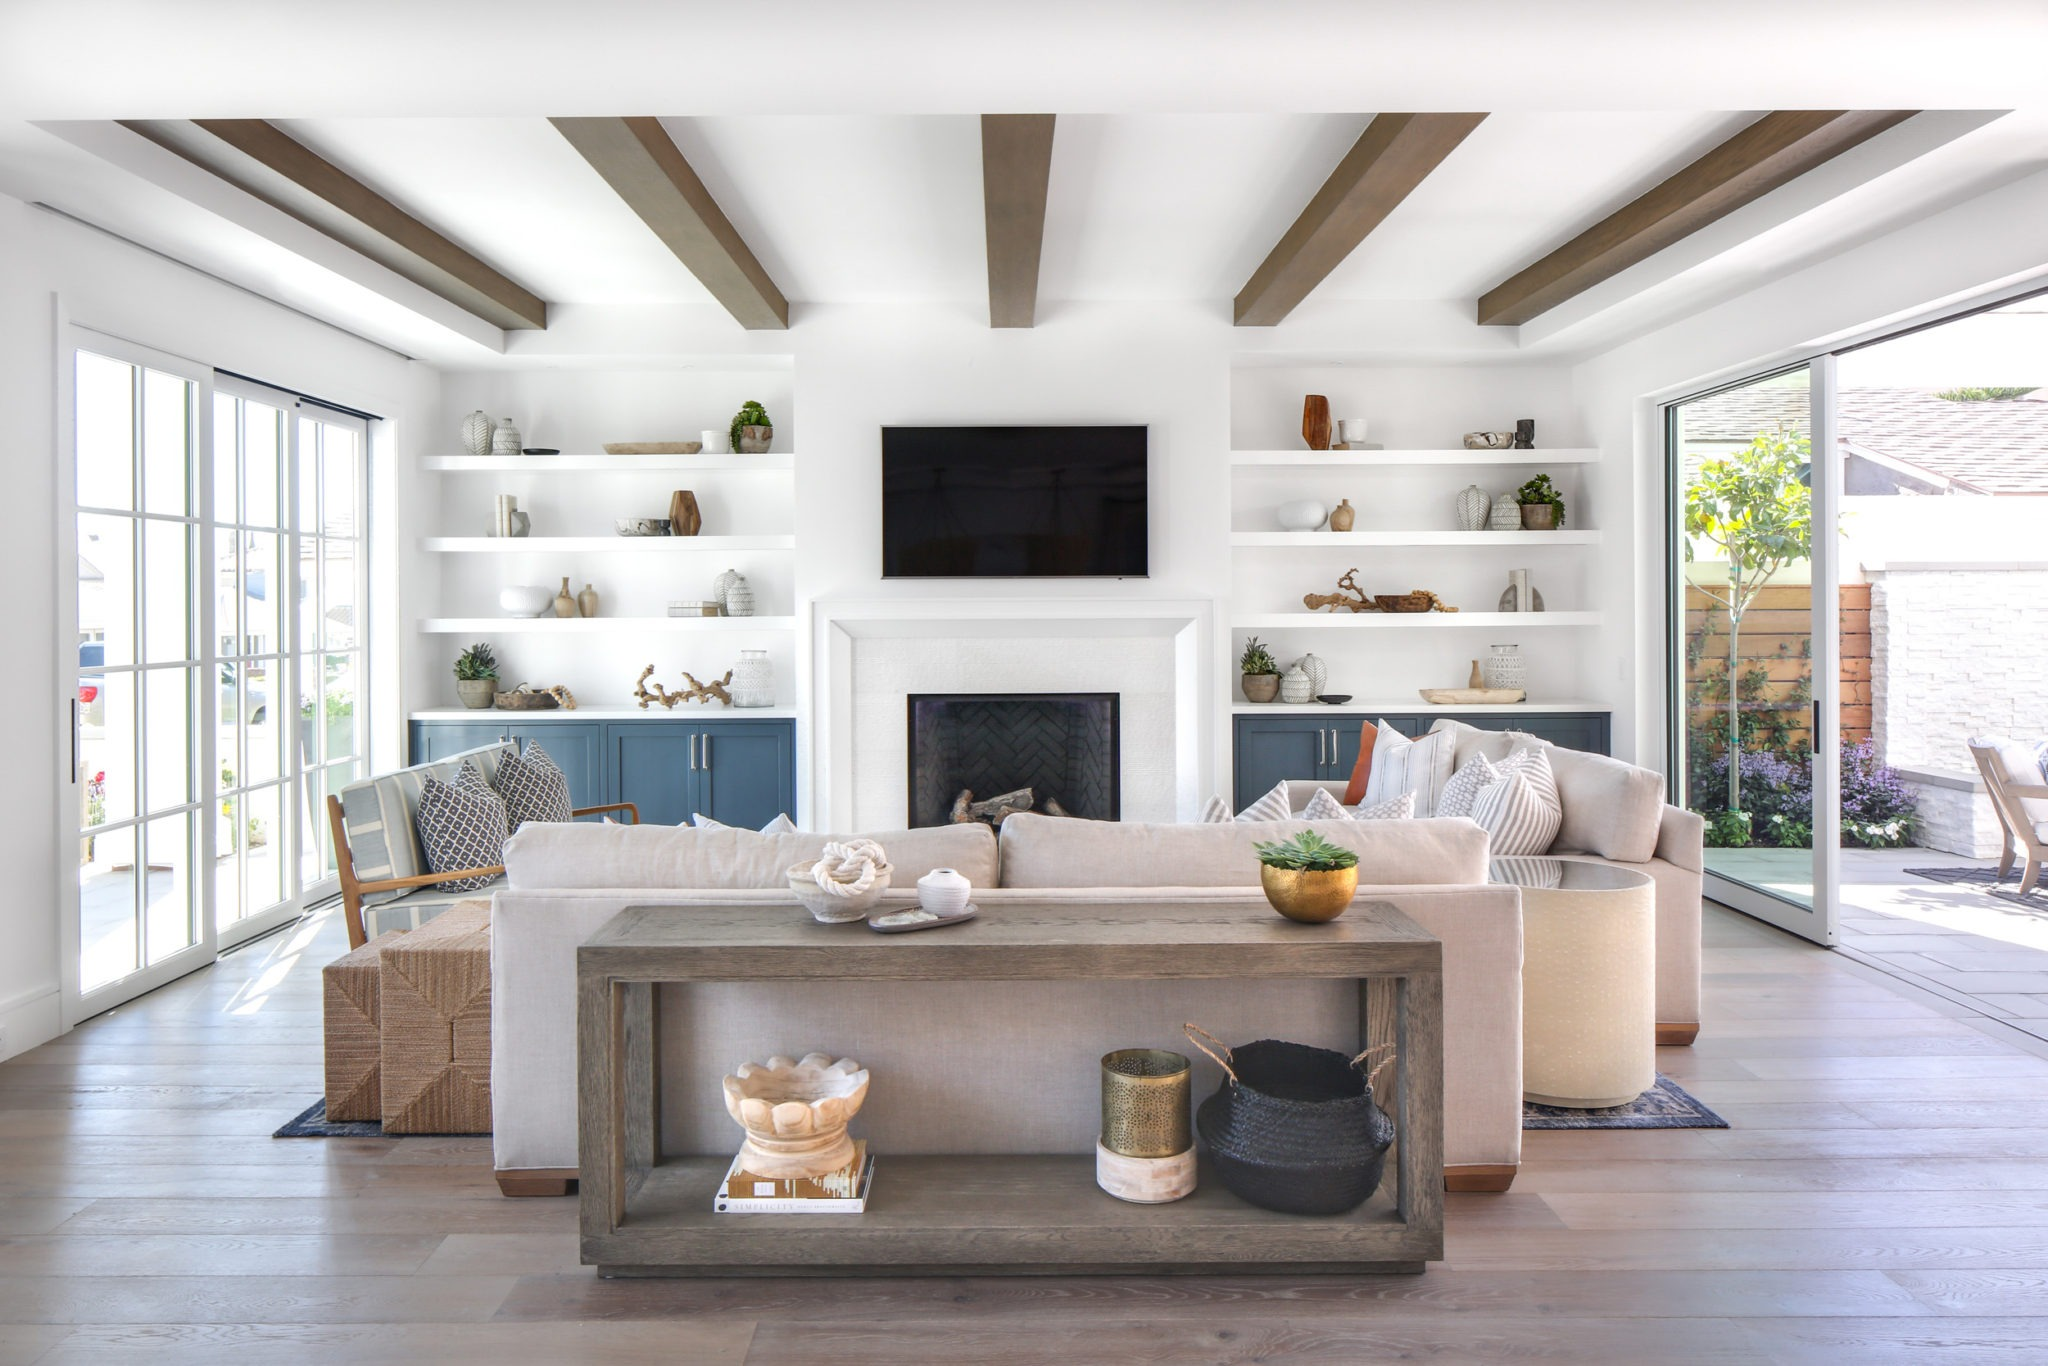 captivating contemporary coastal interior design | Larkspur Avenue New Build - Lindye Galloway Interiors